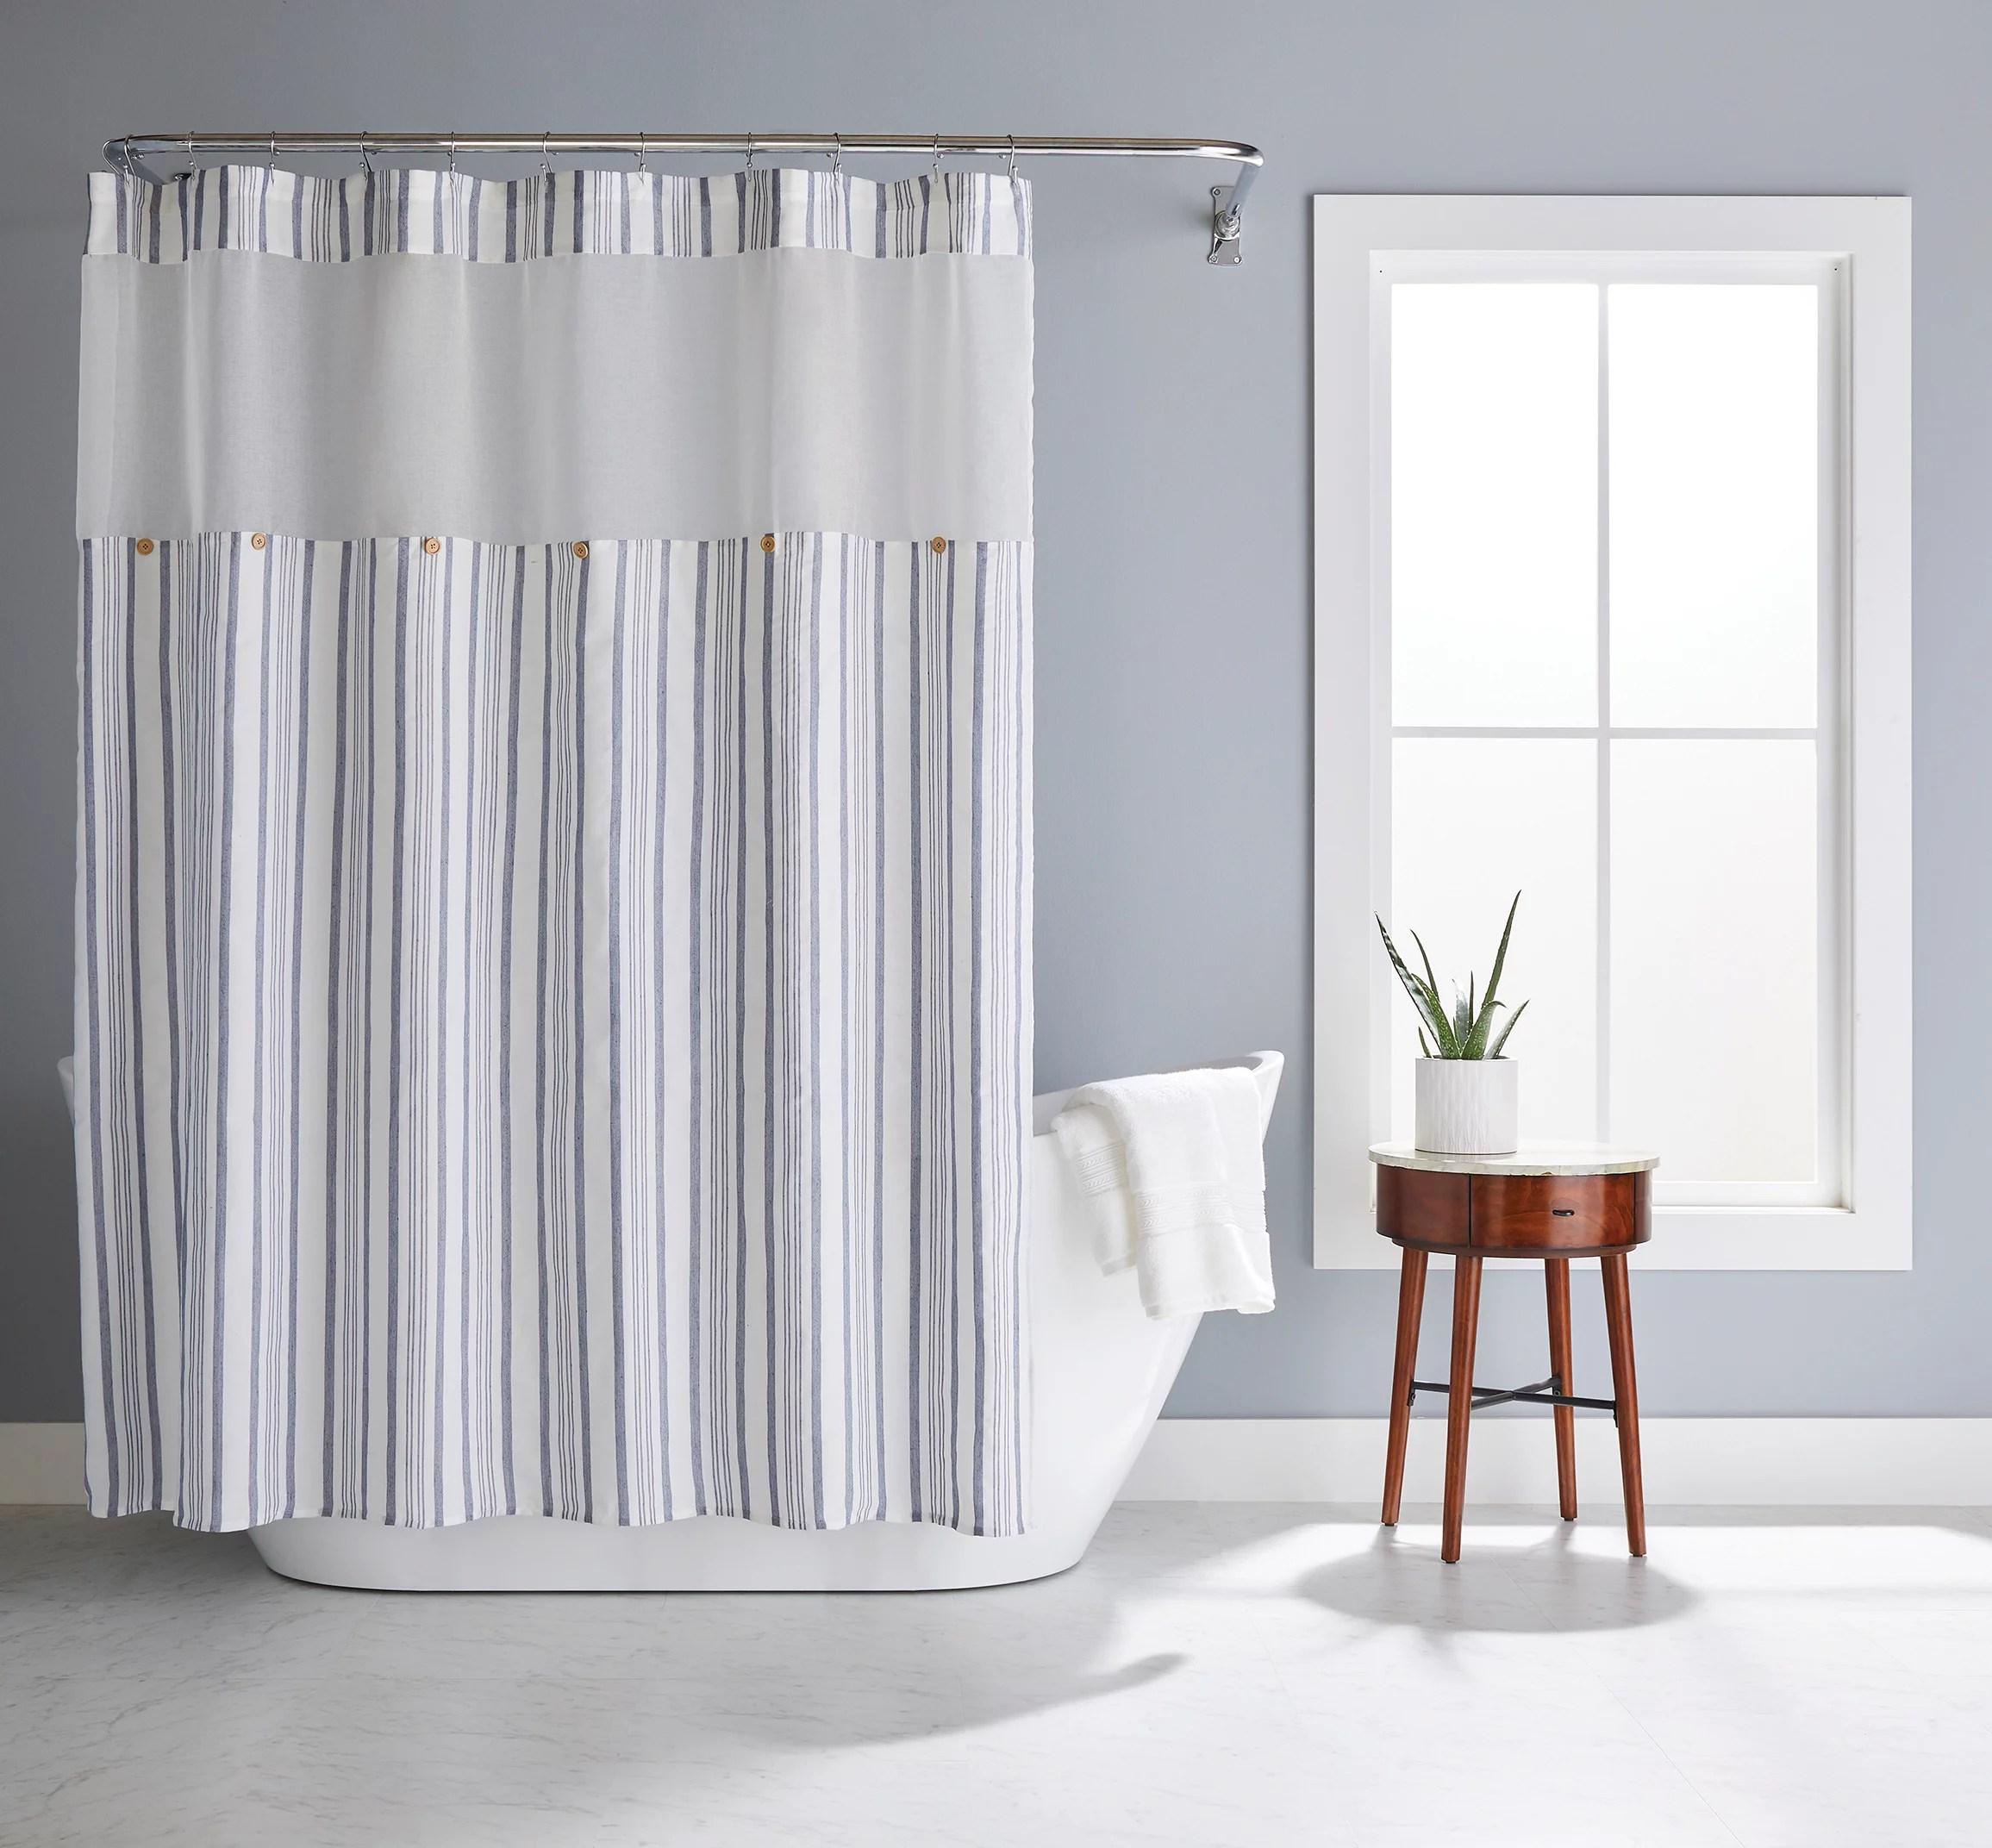 better homes gardens blue stripe polyester shower curtain blue white 72 x 72 walmart com